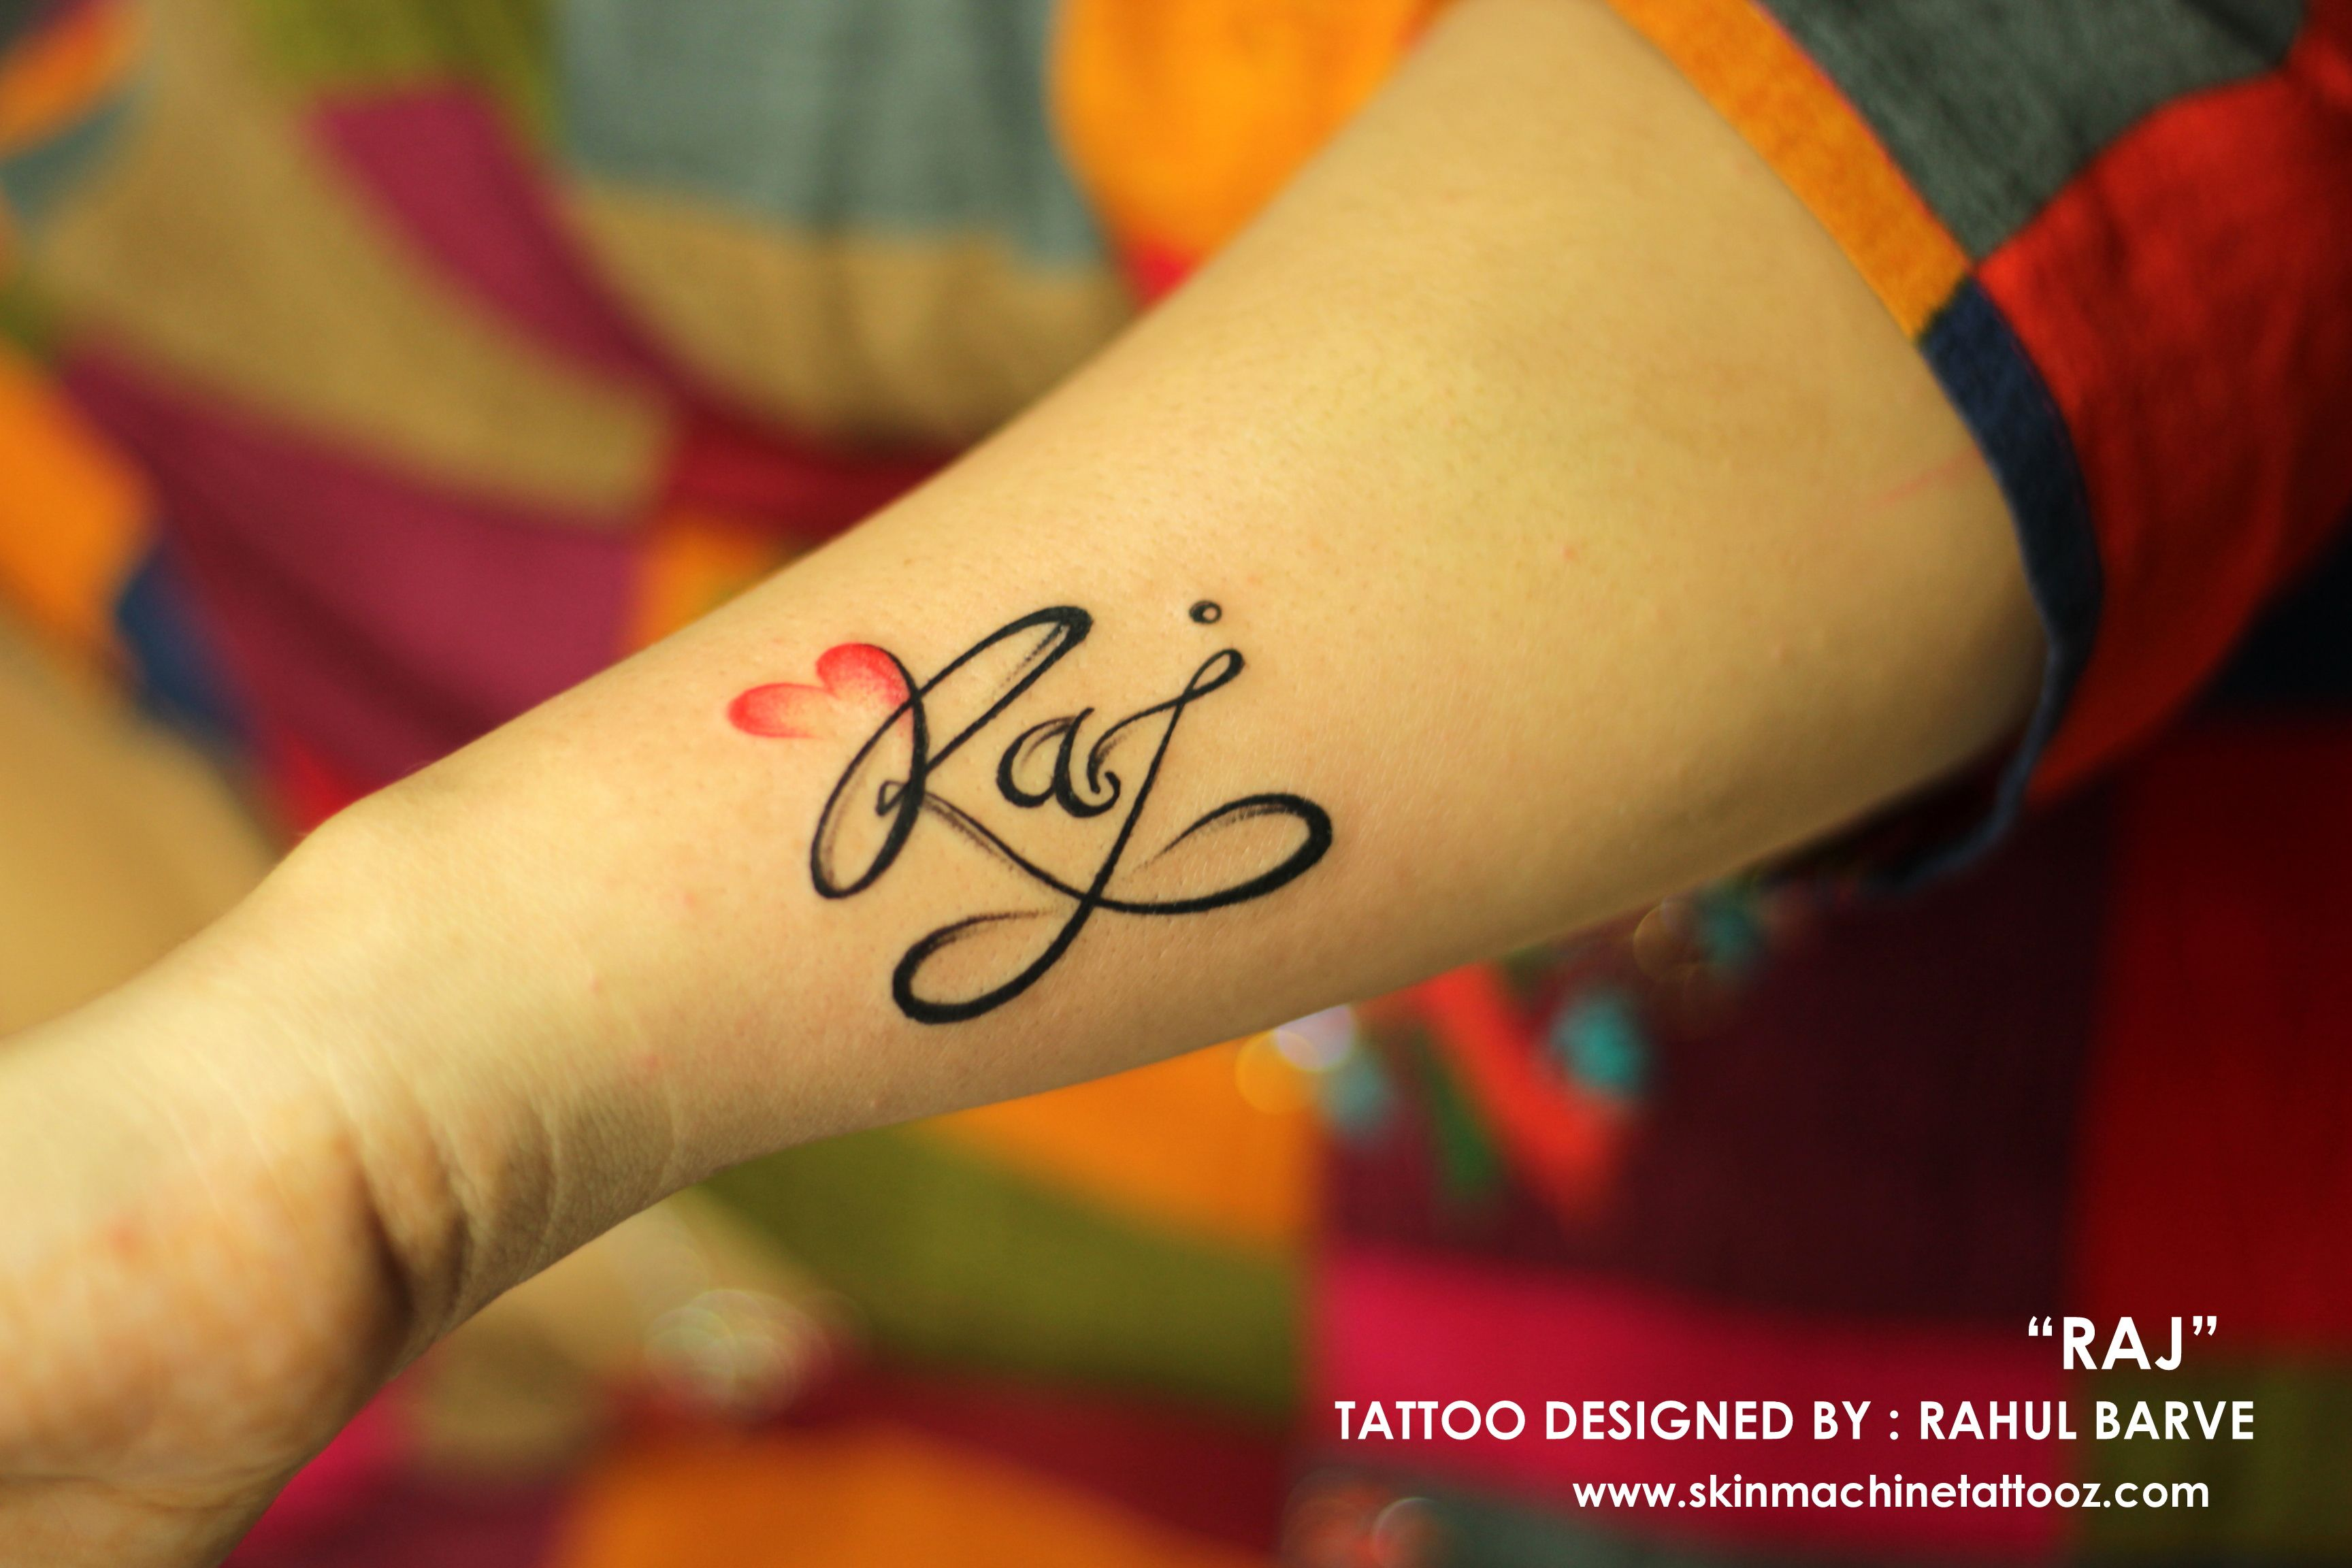 Raj Name Tattoo Designed By Rahul Barve Skin Machine Tattoo